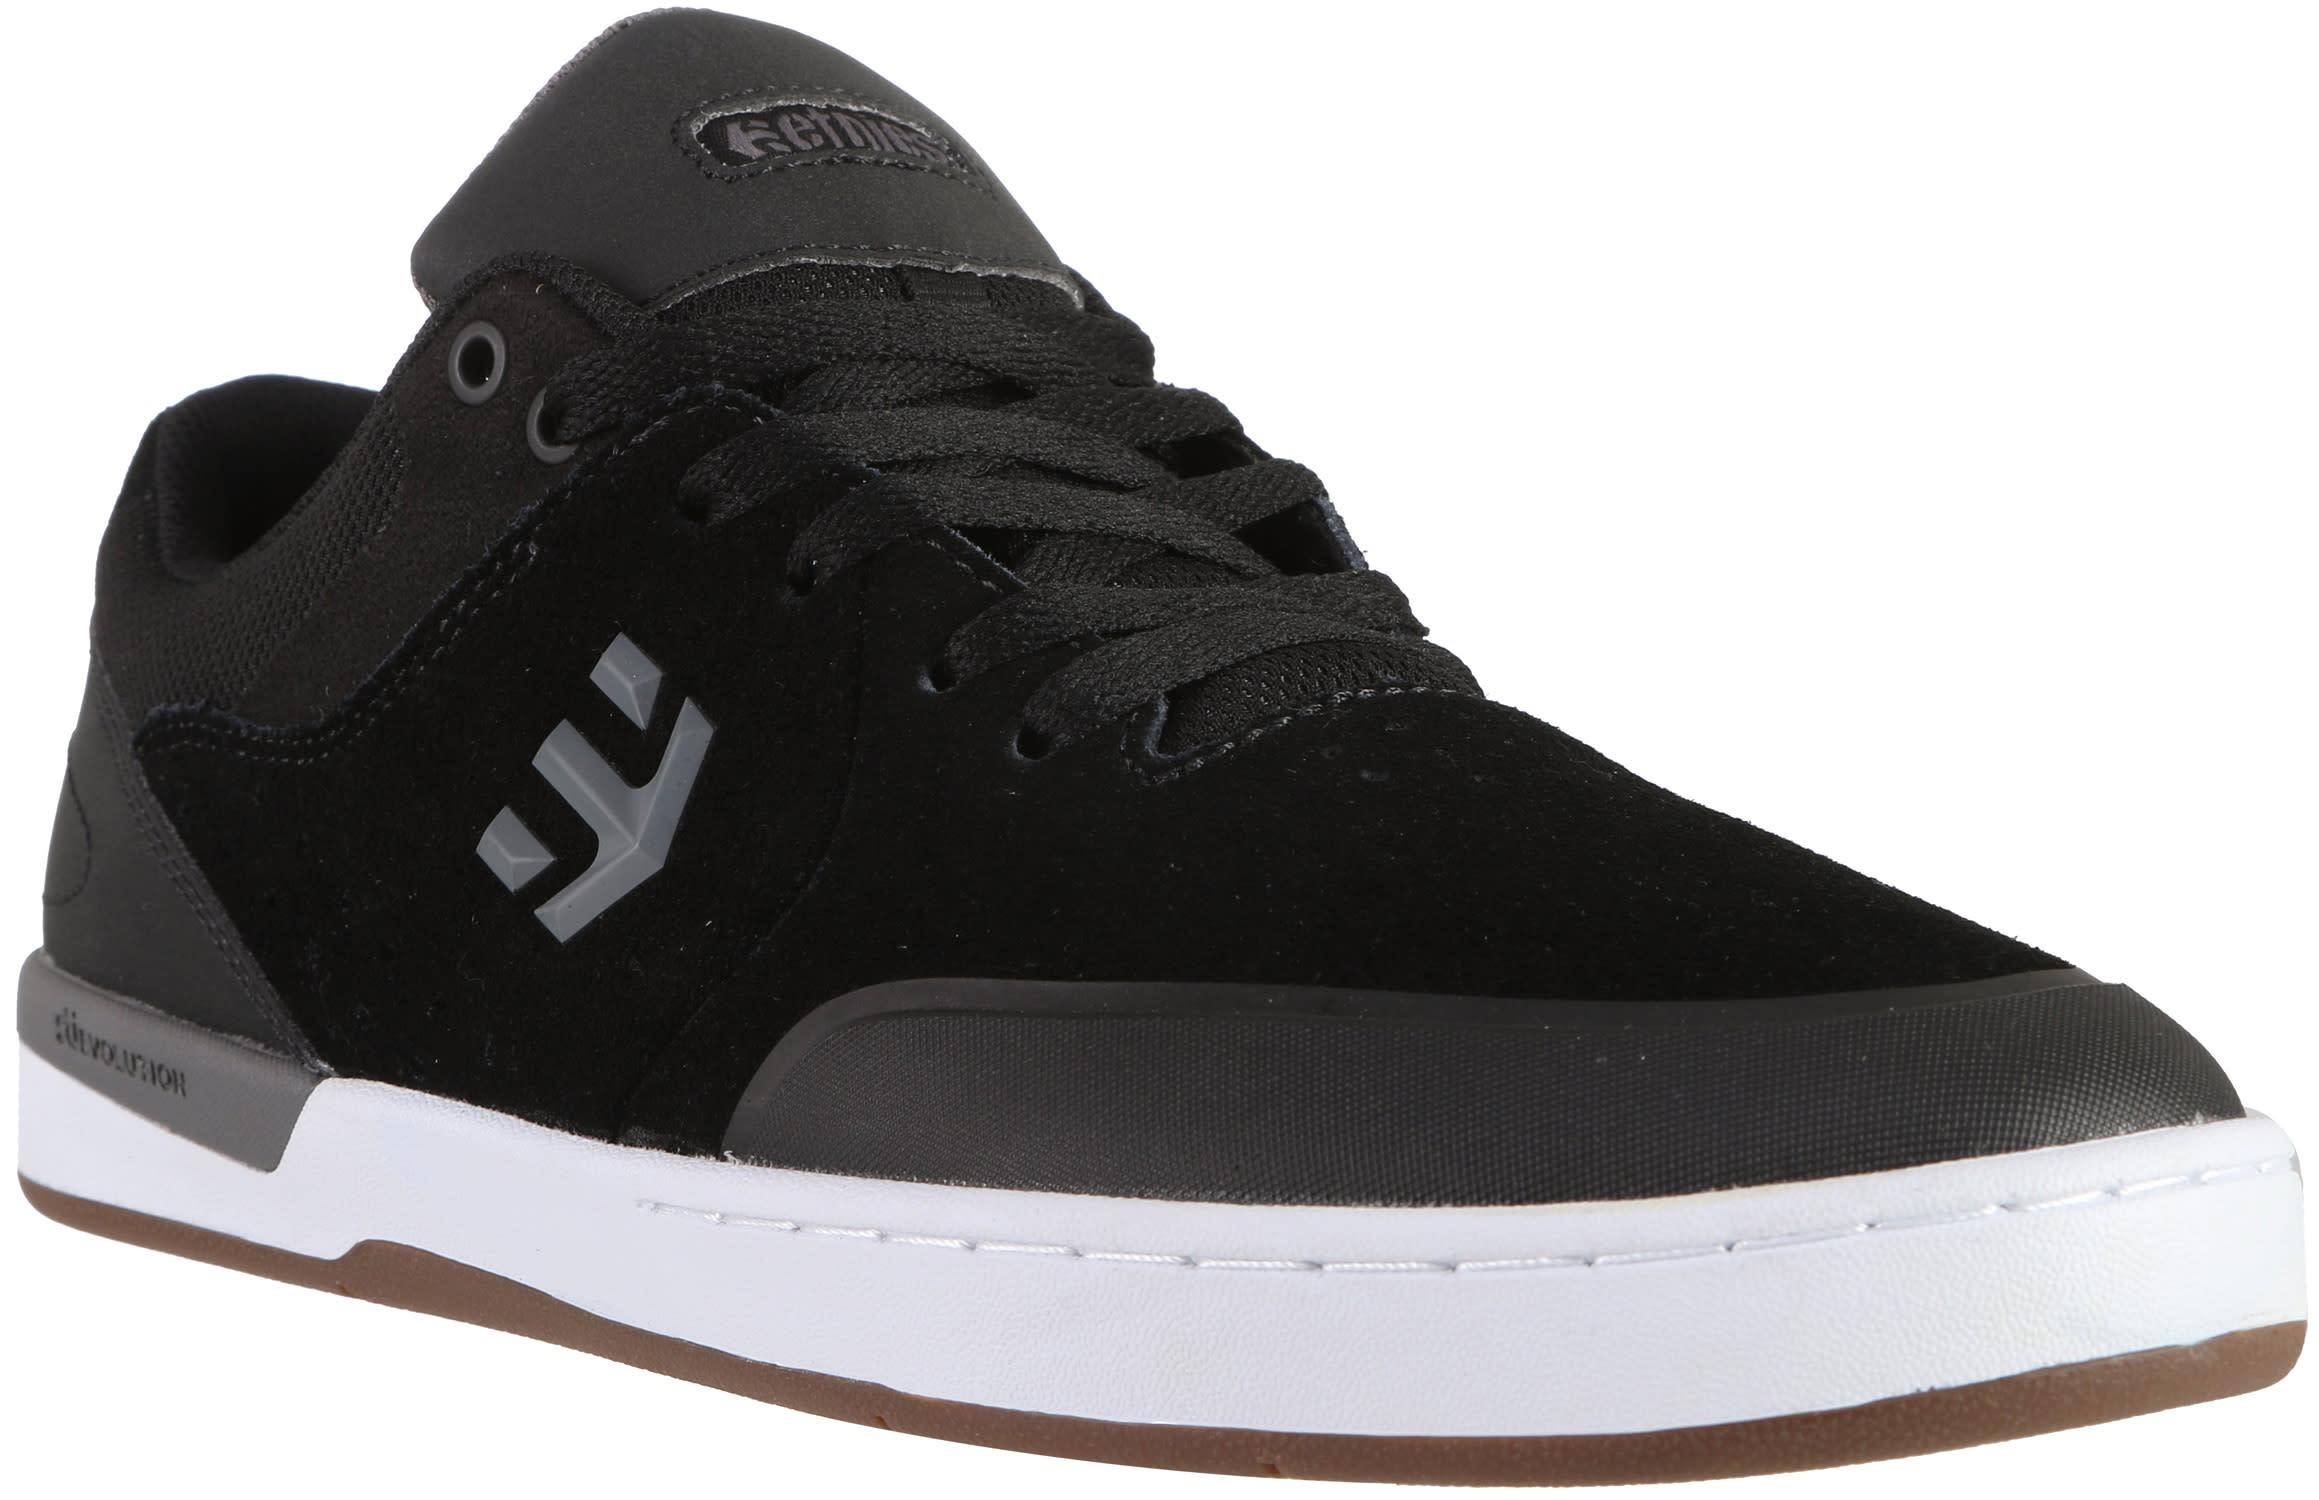 On Sale Etnies Marana XT Ryan Sheckler Skate Shoes up to ...